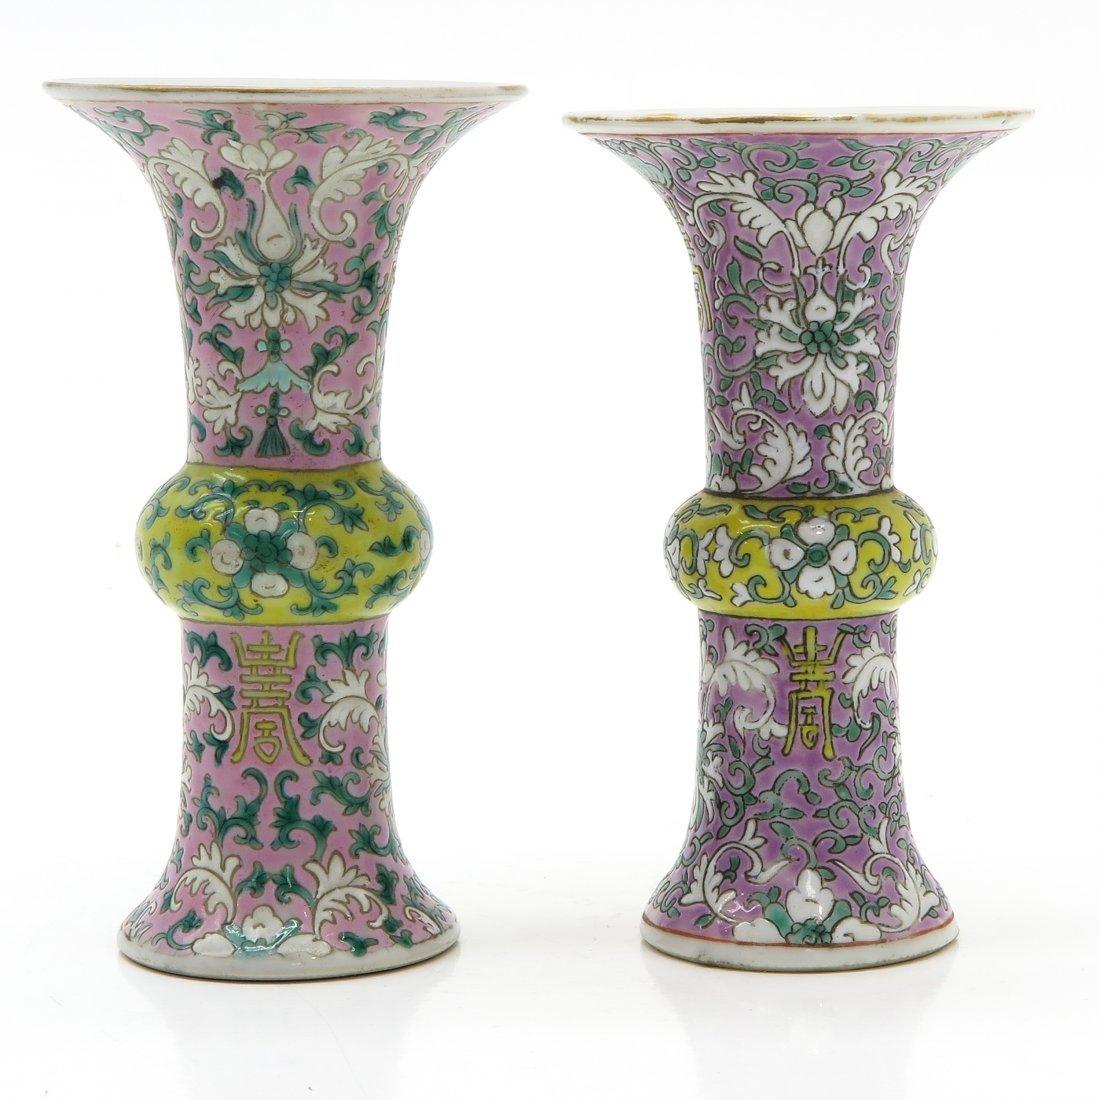 Pair of China Porcelain Altar Vases